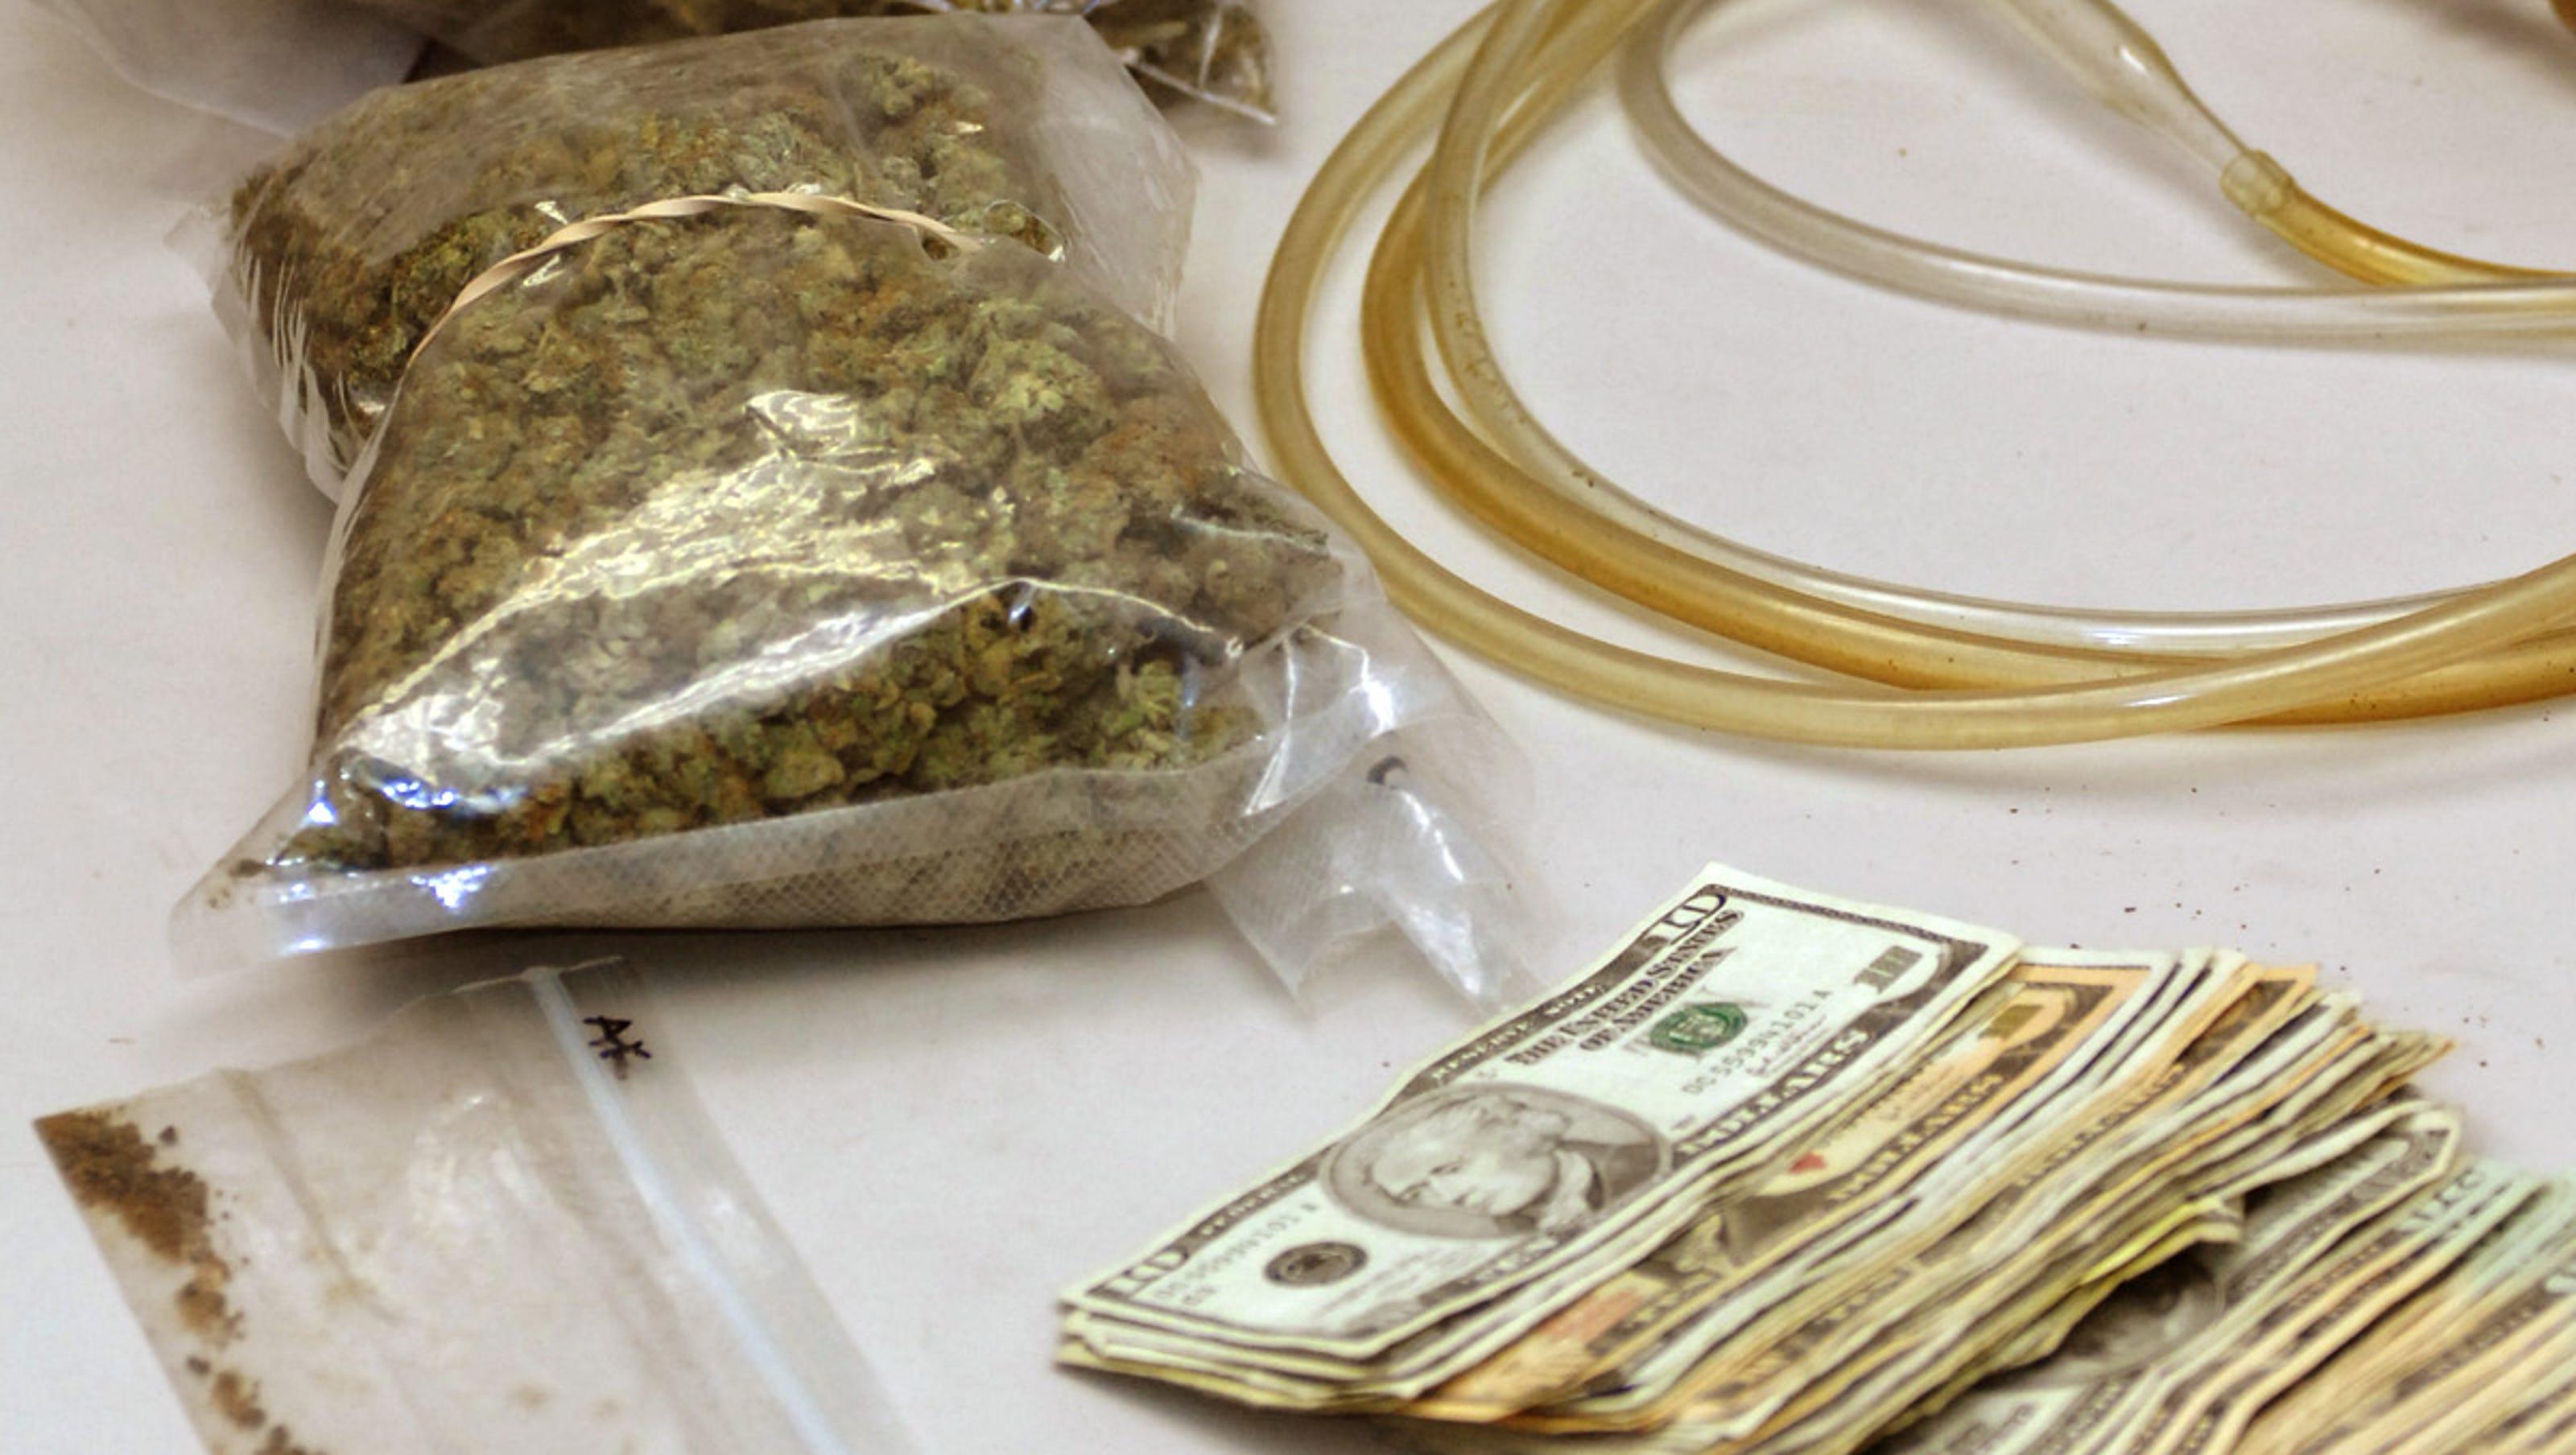 How will legalizing marijuana impact police work?